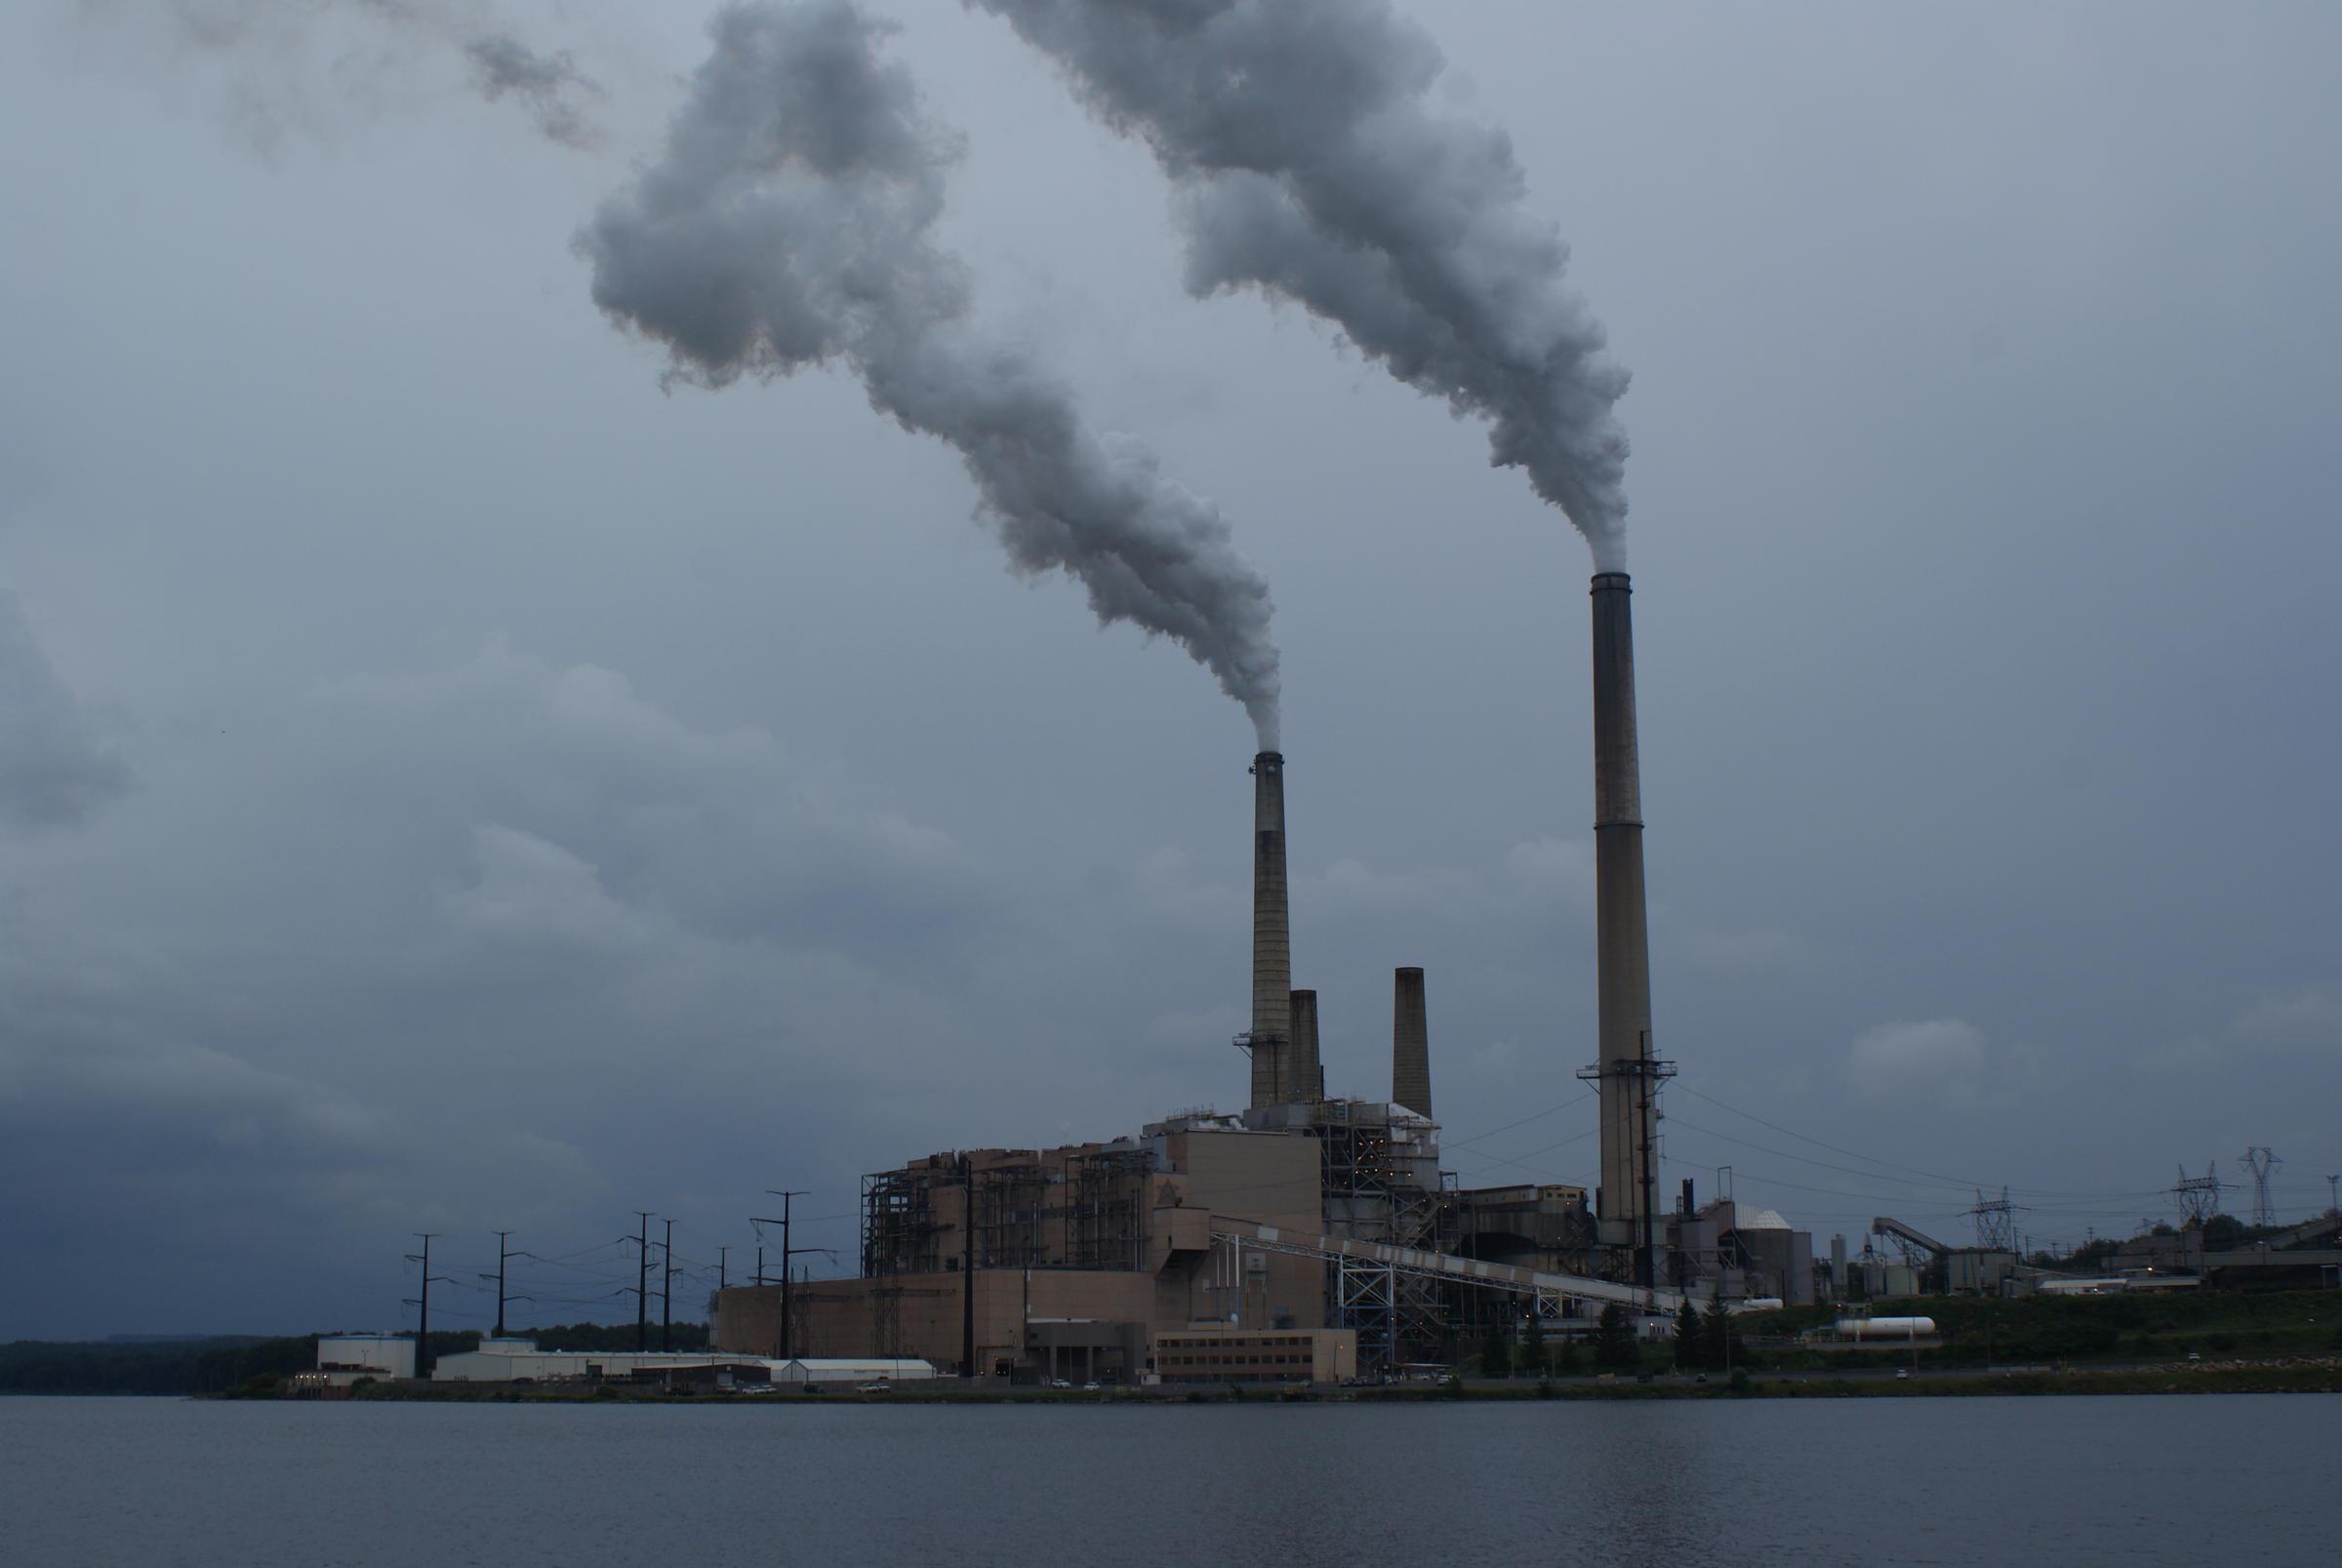 Appalachian Power to Close 3 Coal Fired Plants